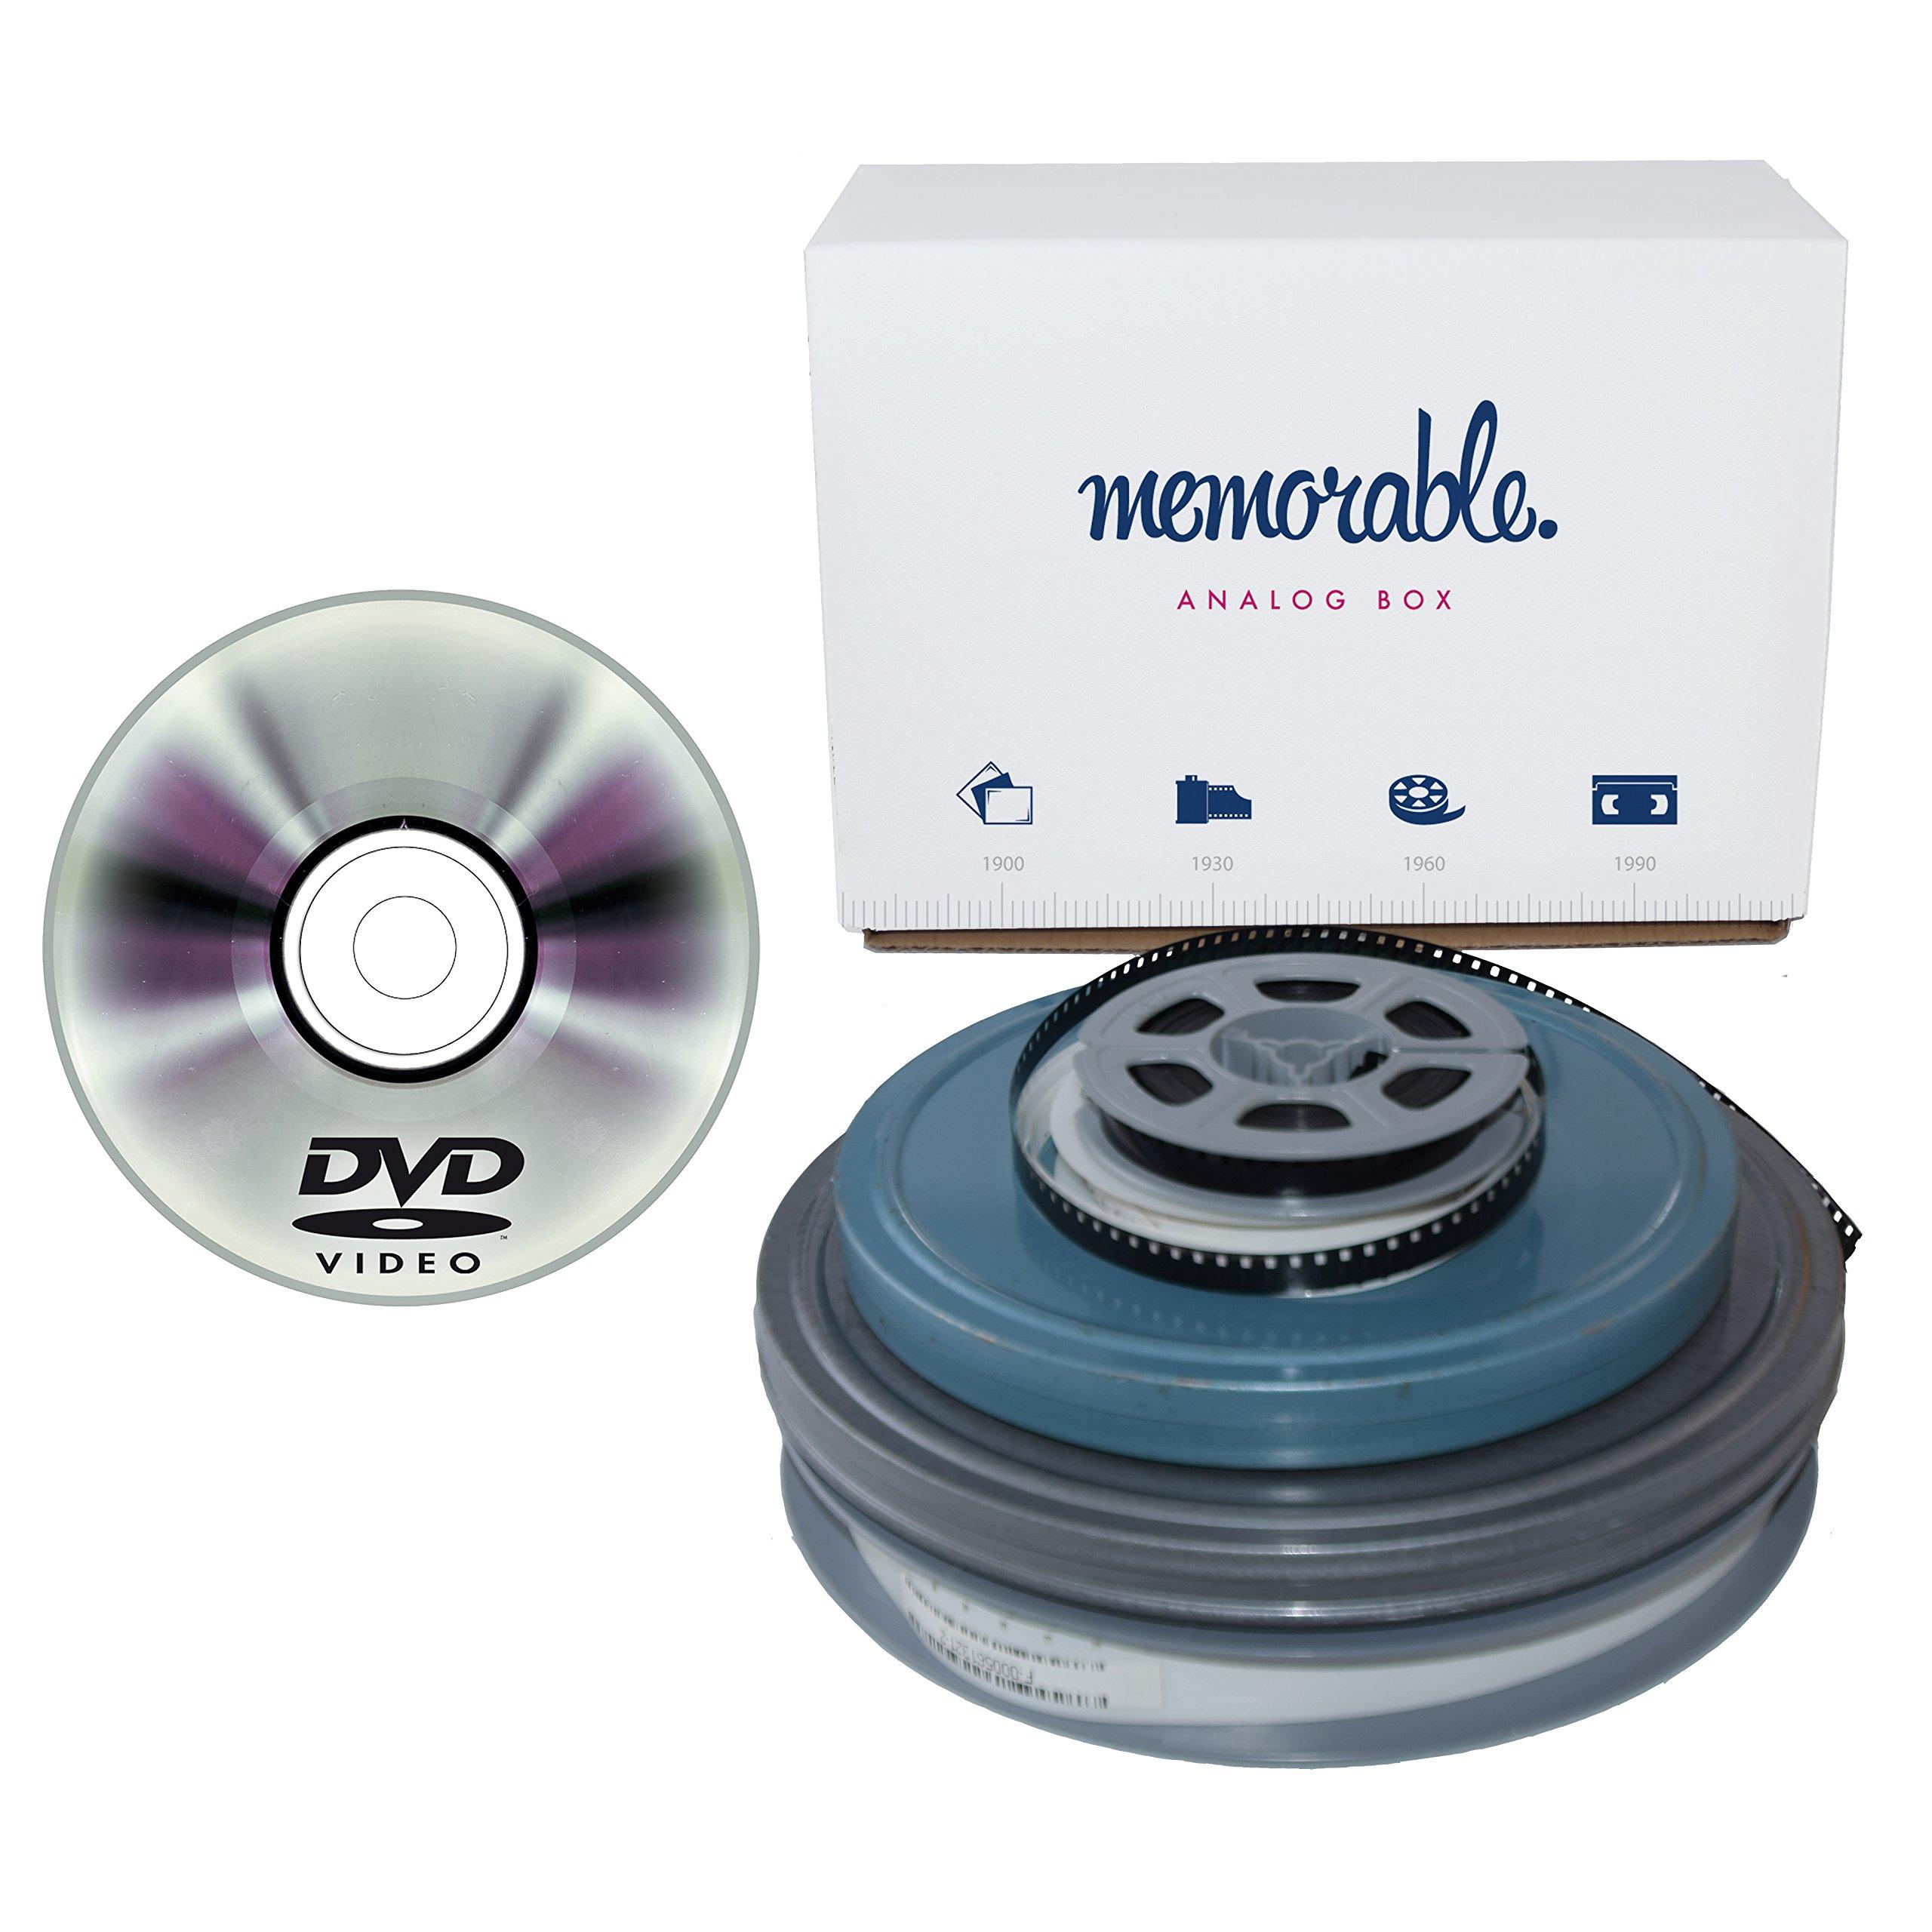 memorable Film Transfer Service (8mm, Super 8, 16mm) to DVD - 50 Reels by Memorable